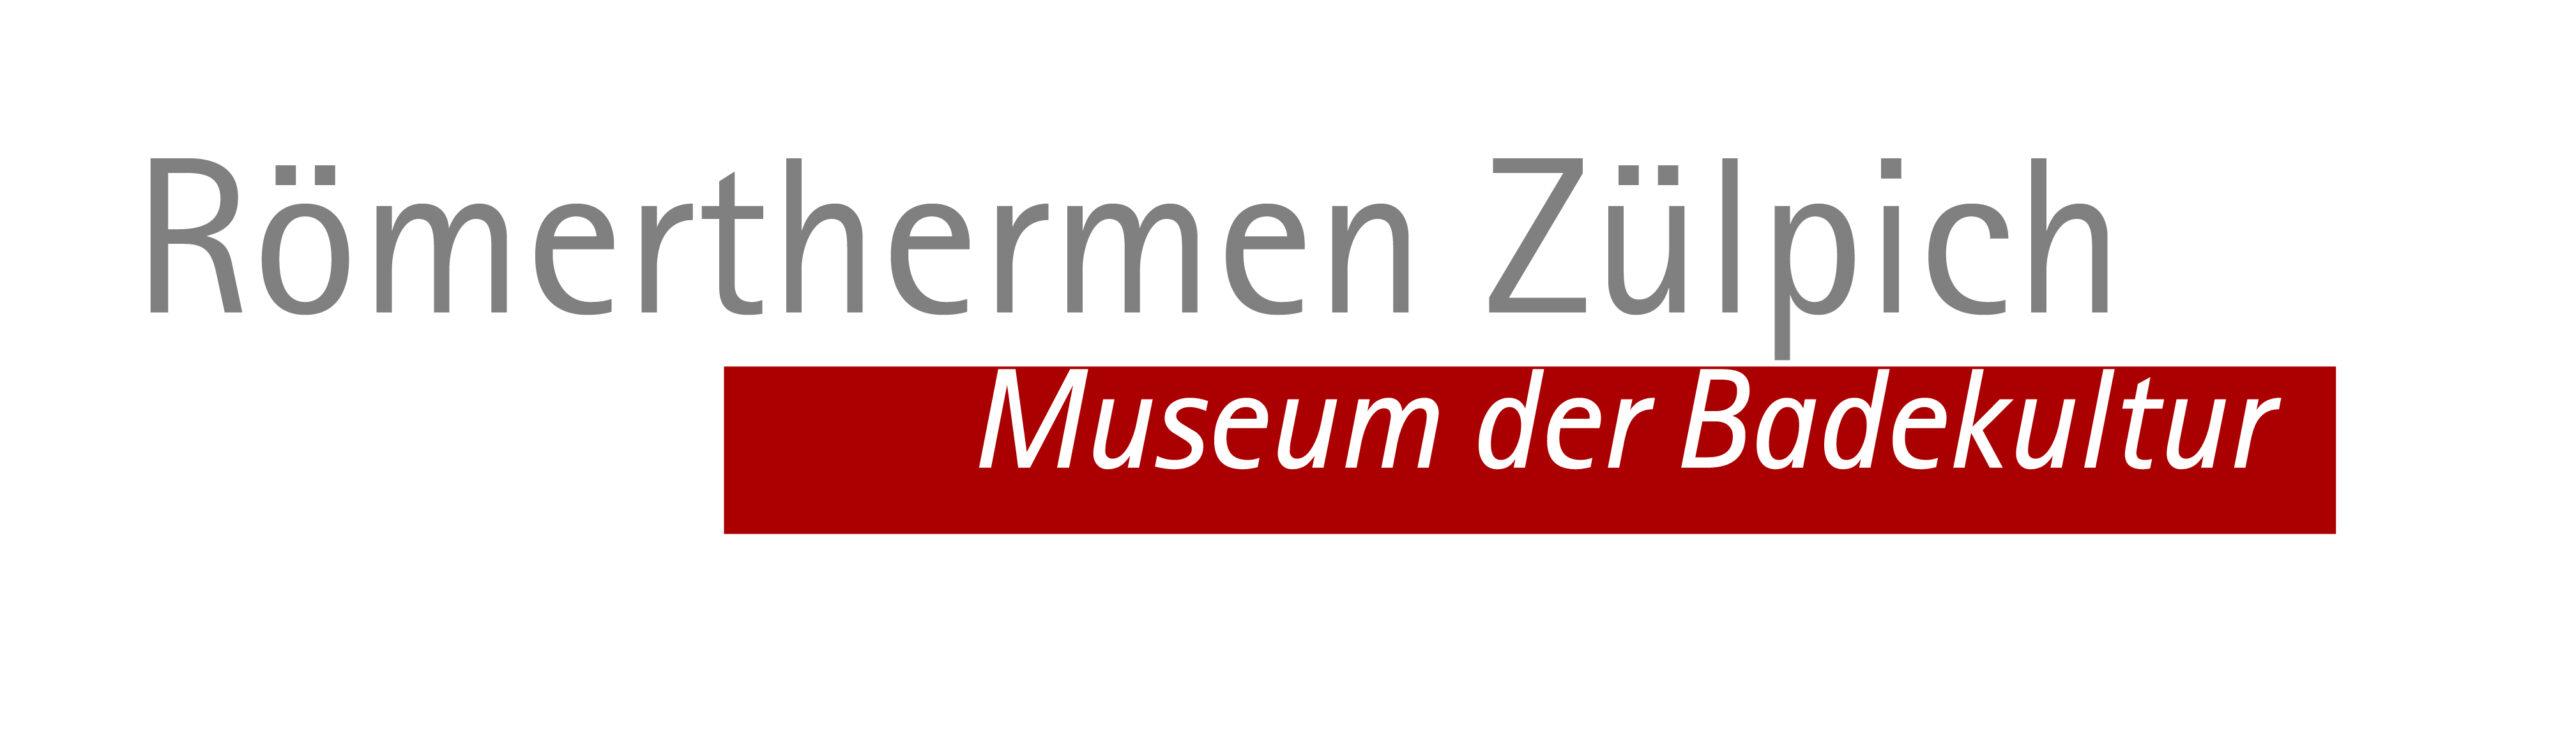 Römerthermen Zülpich- Museum der Badekultur